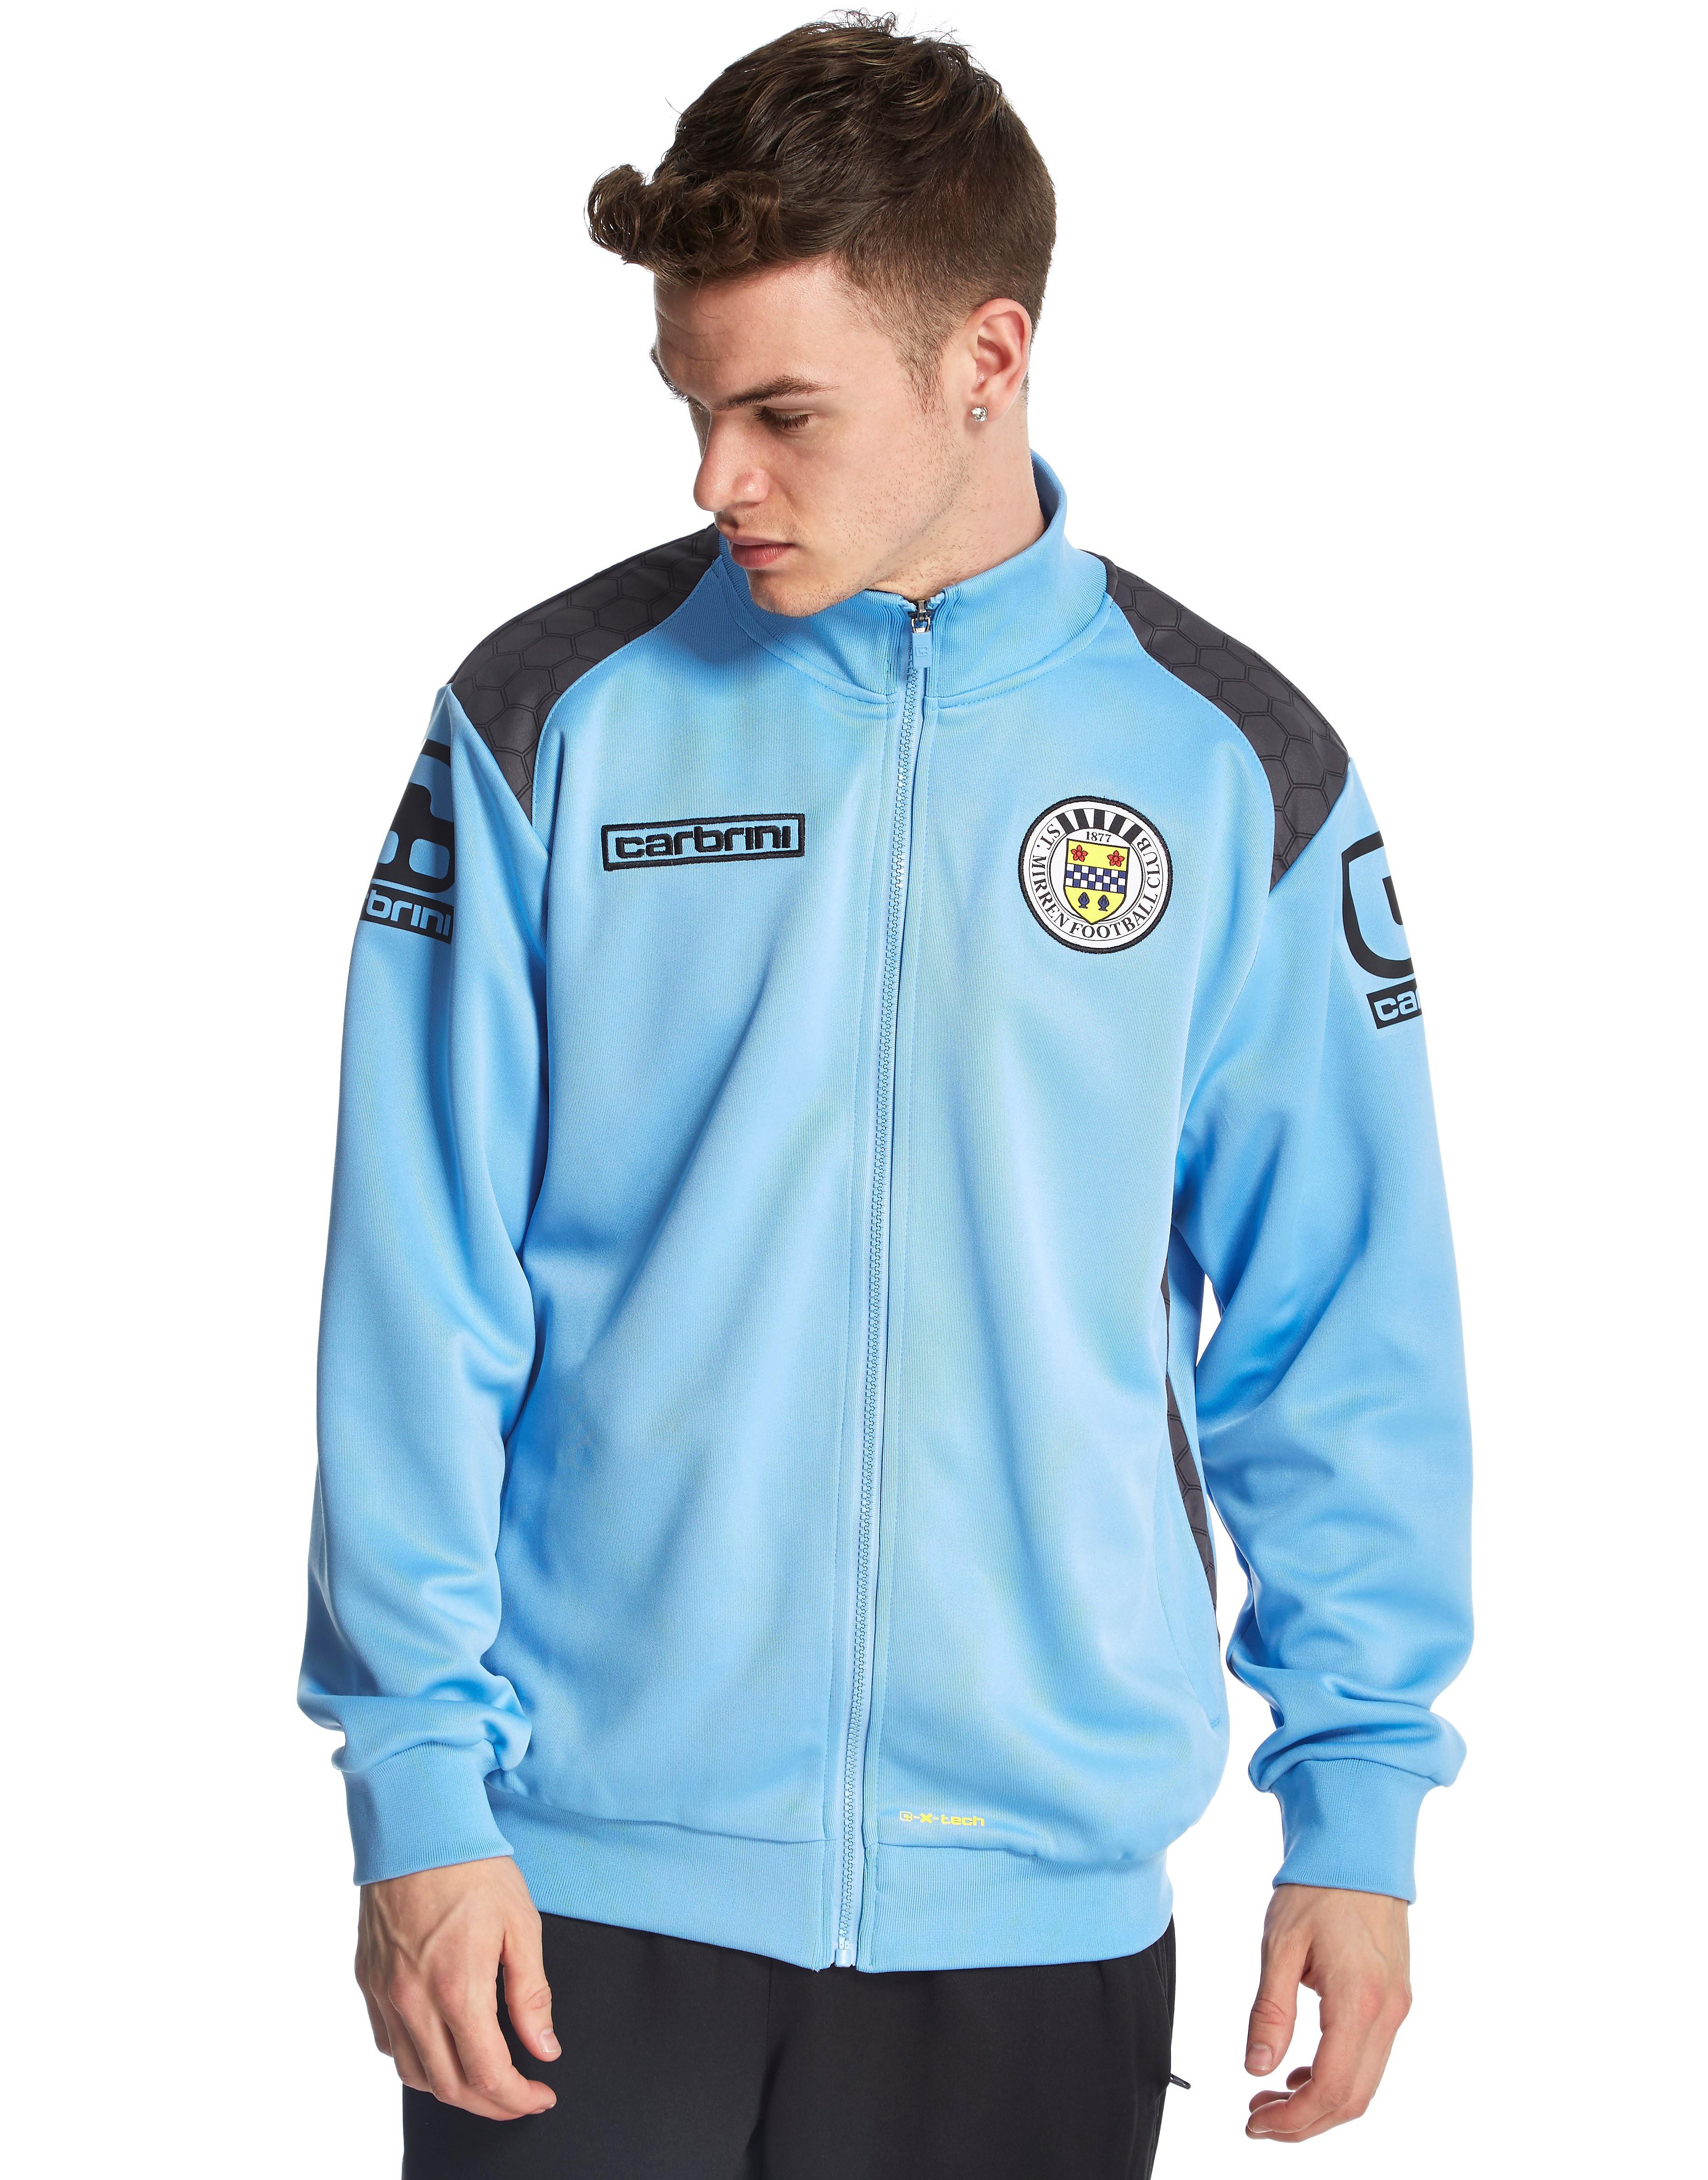 Carbrini St Mirren FC 2015/16 Track Jacket